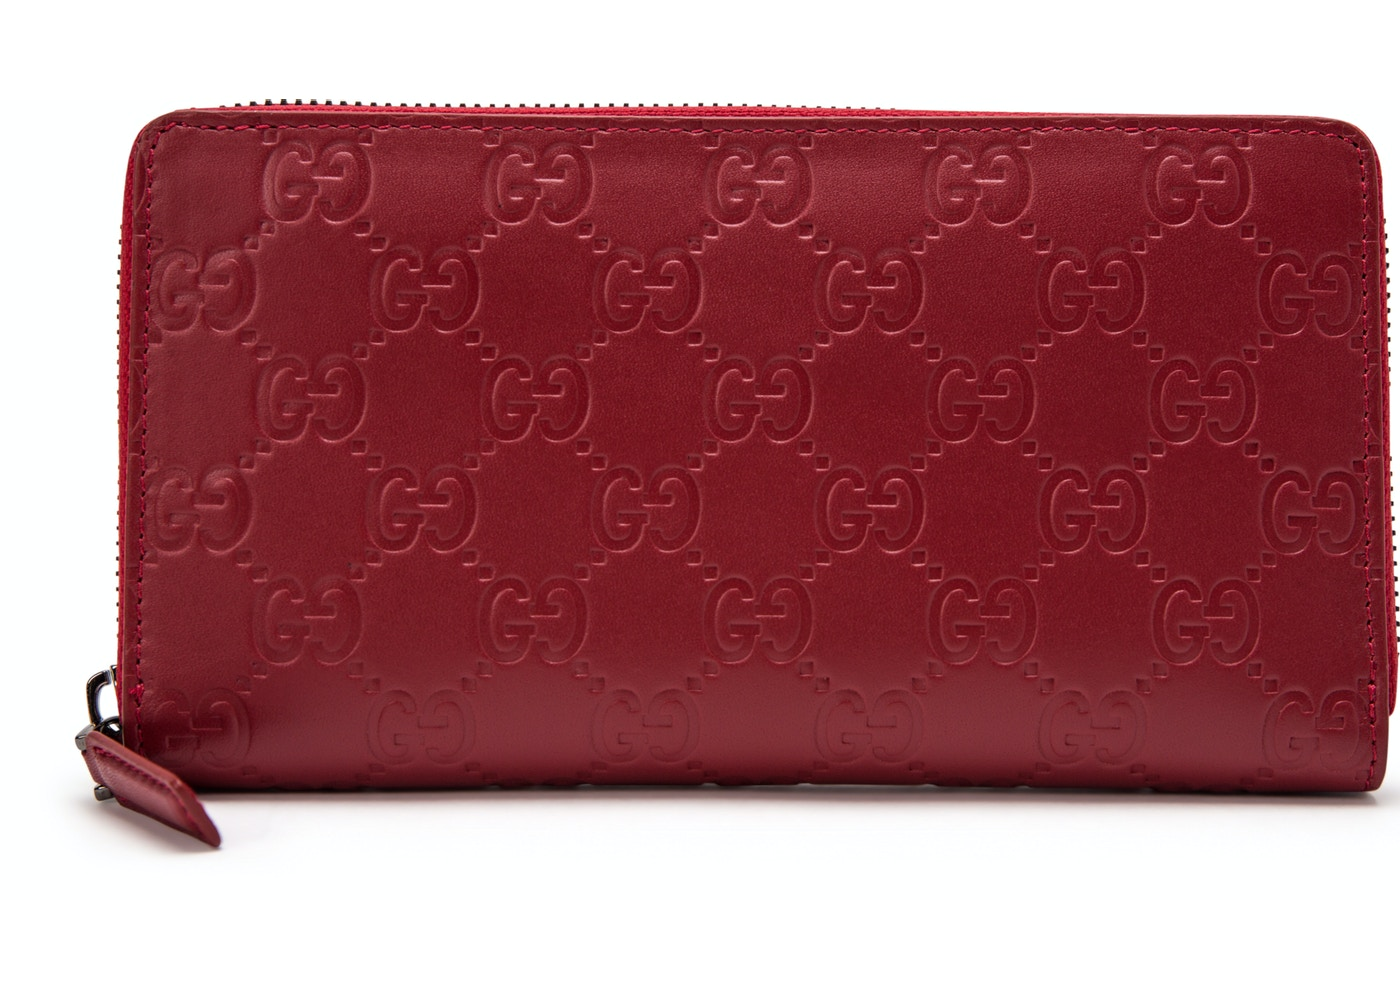 60984edcdff Gucci Zip Around Wallet Signature Red. Signature Red